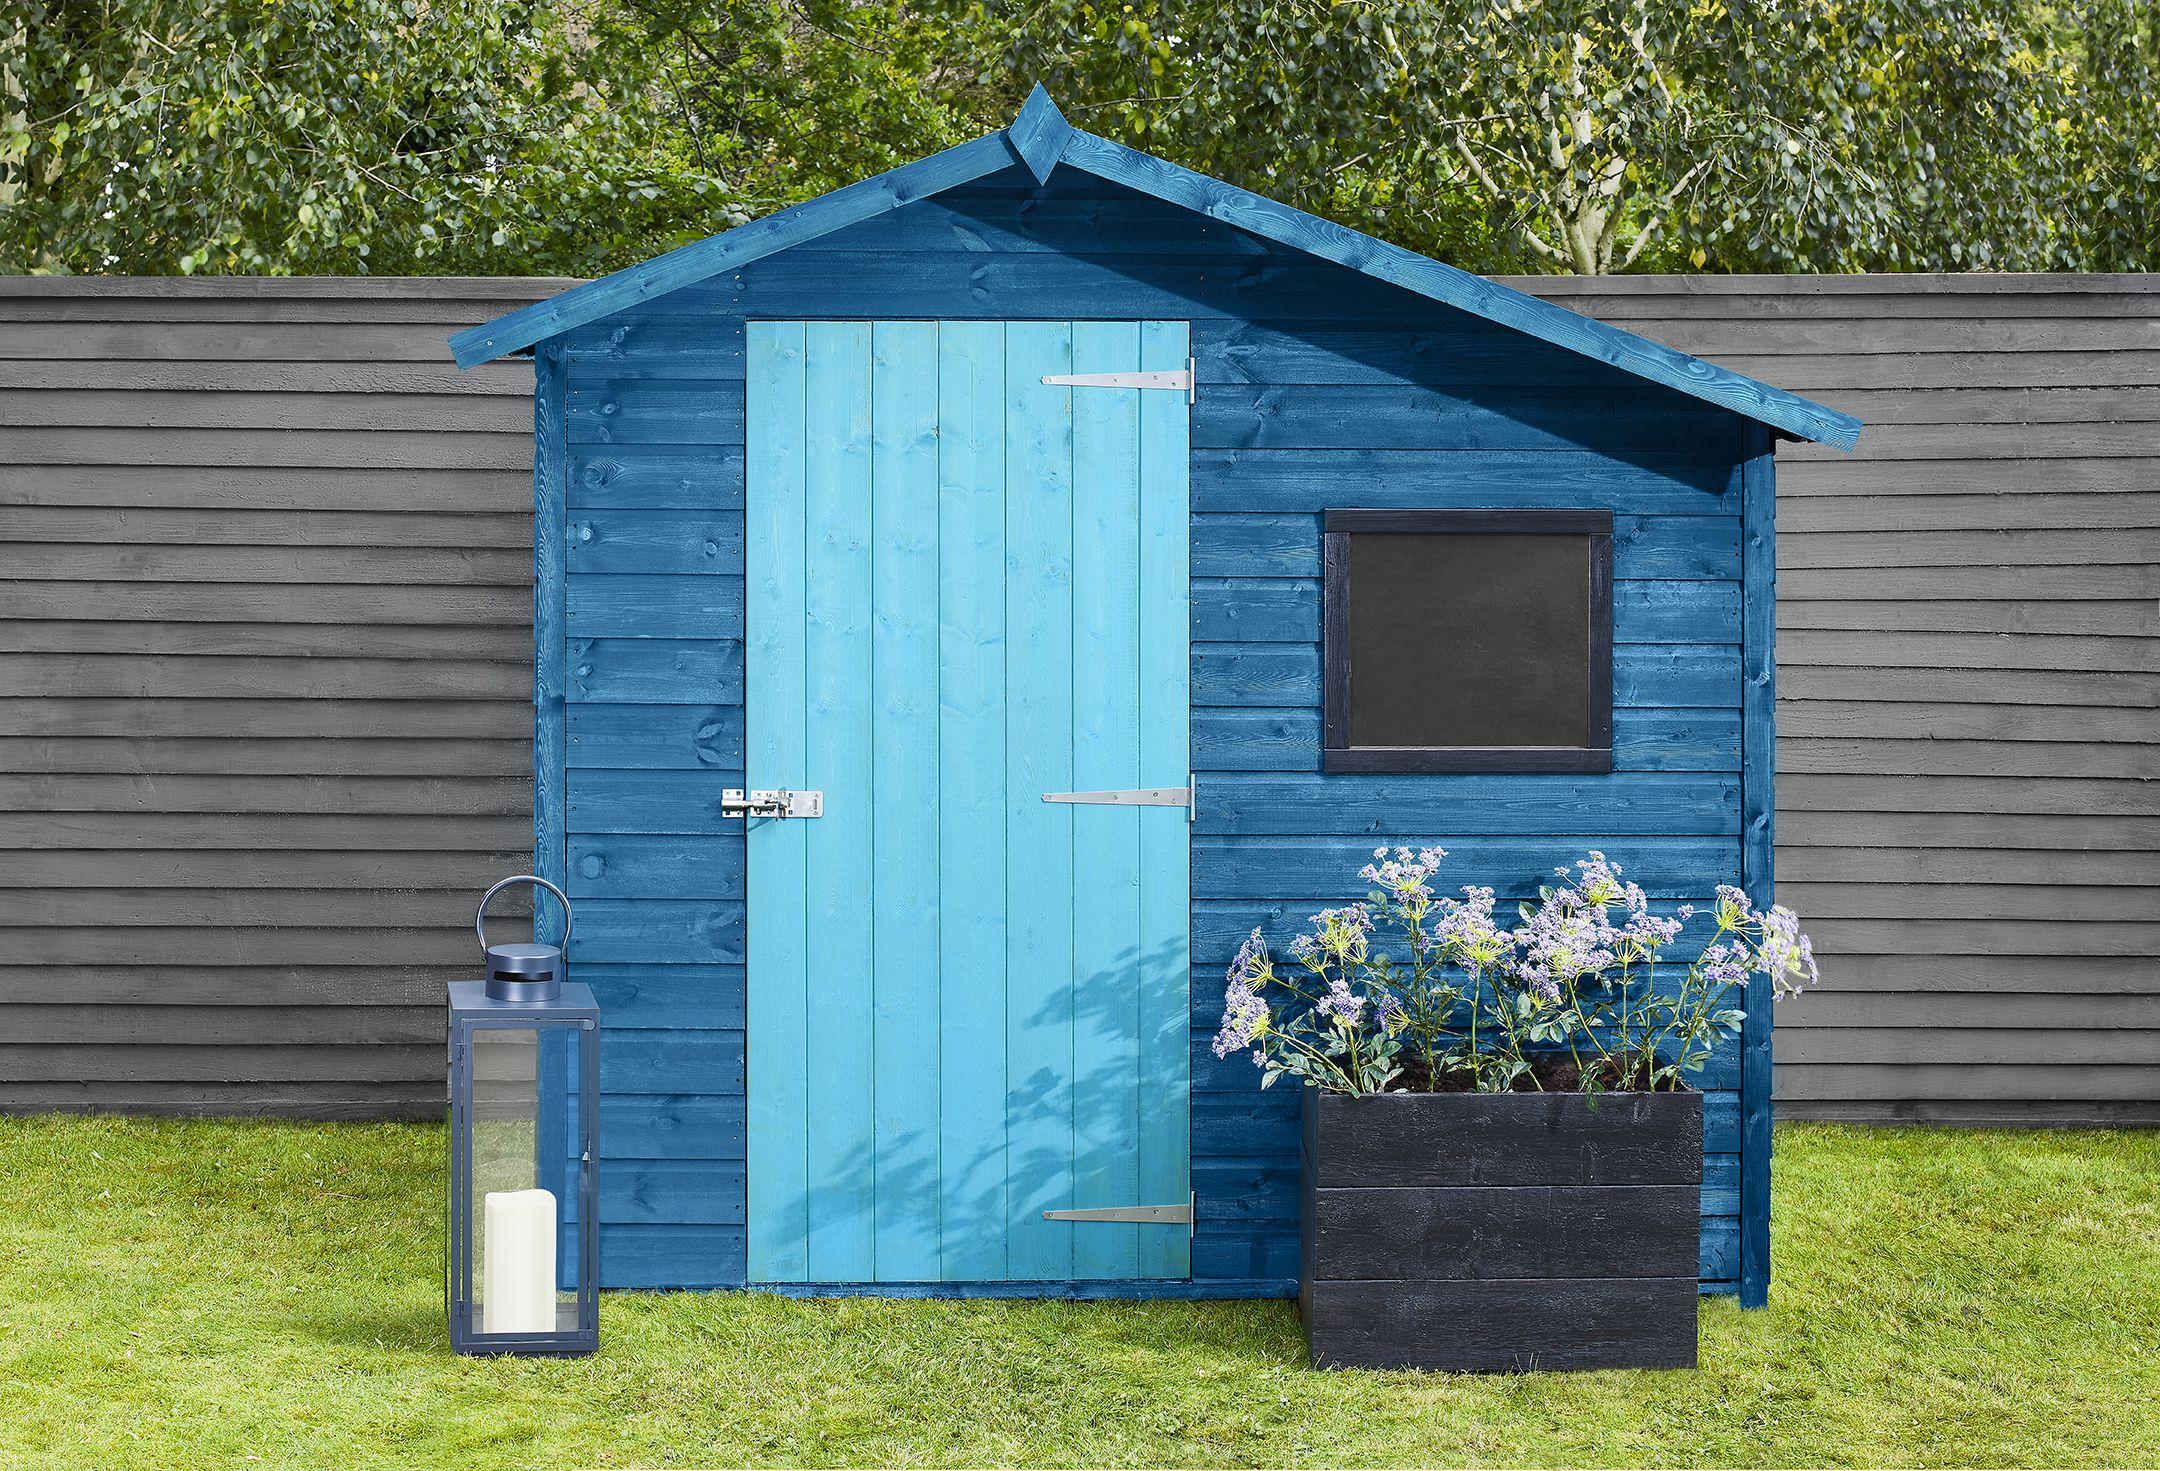 Blue shed grey fence in 2020 blue shed grey fence